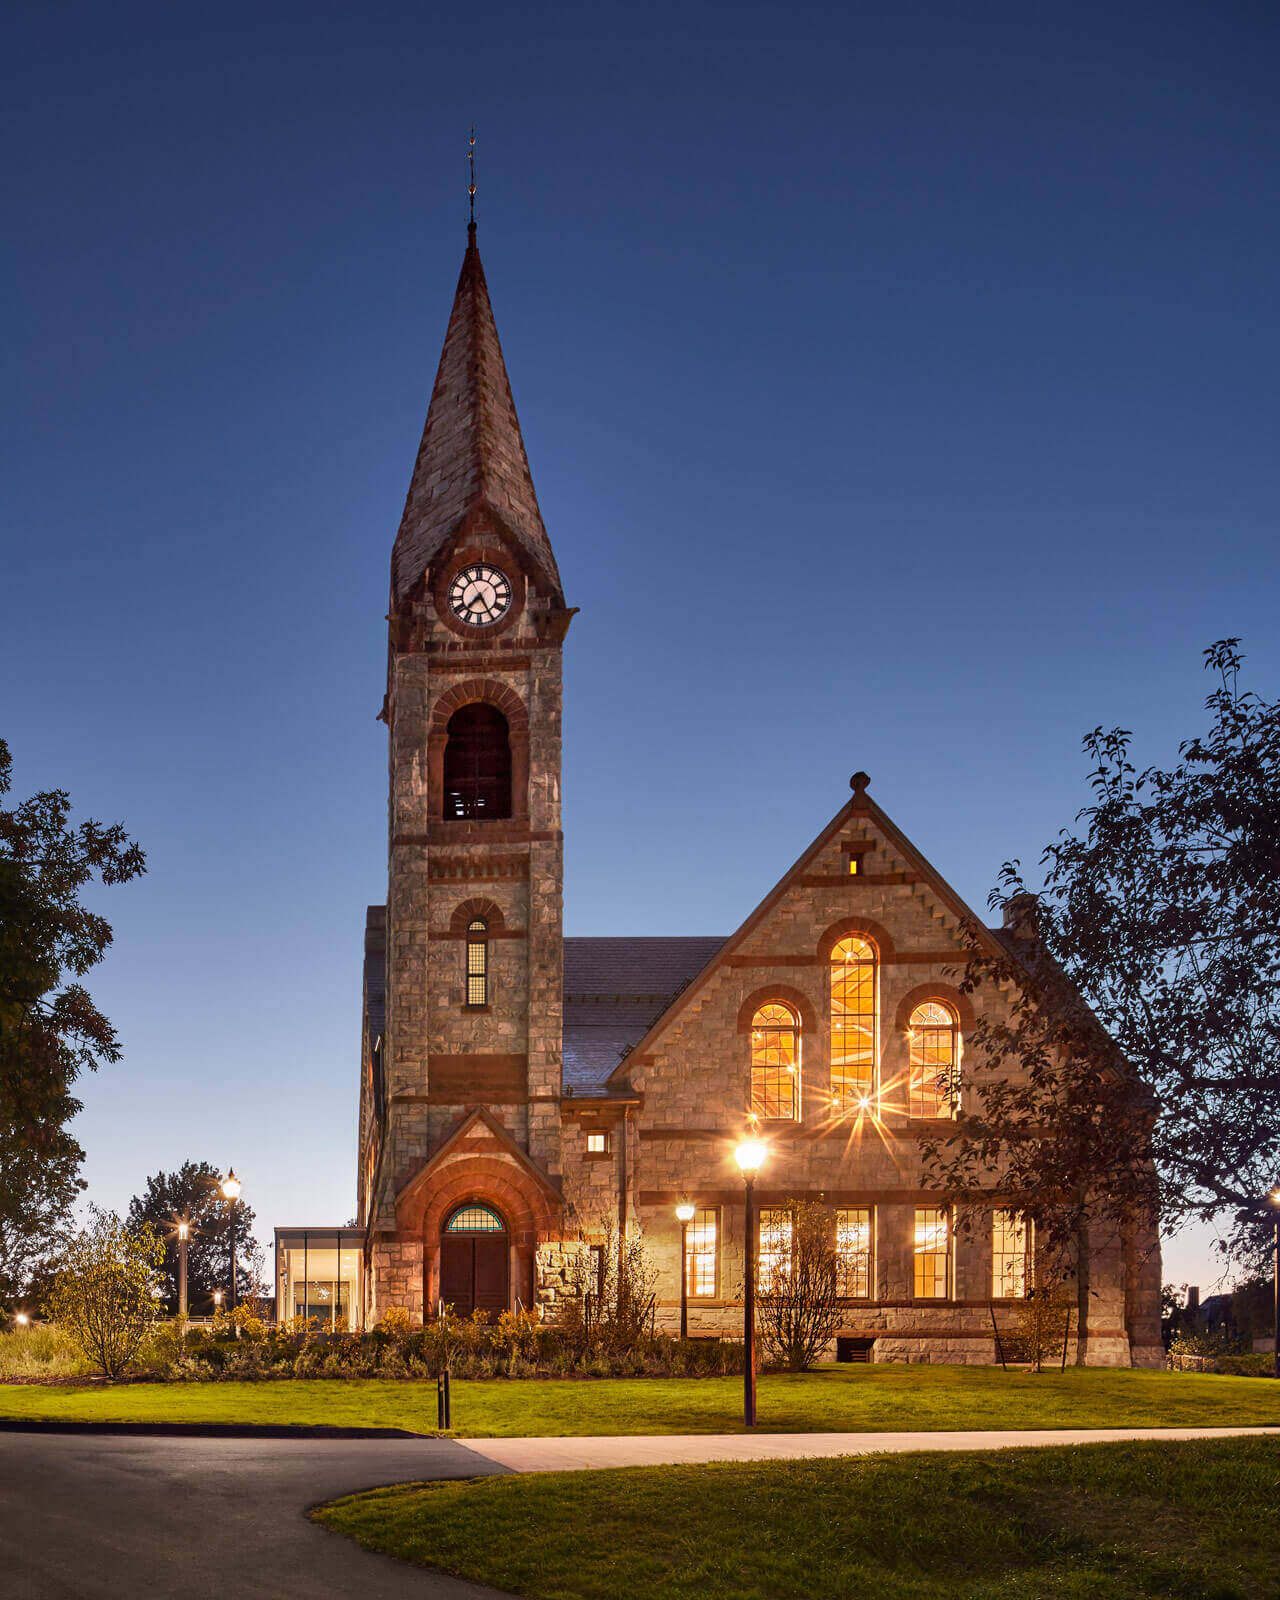 University of Massachusetts, Old Chapel, glowing at dusk.